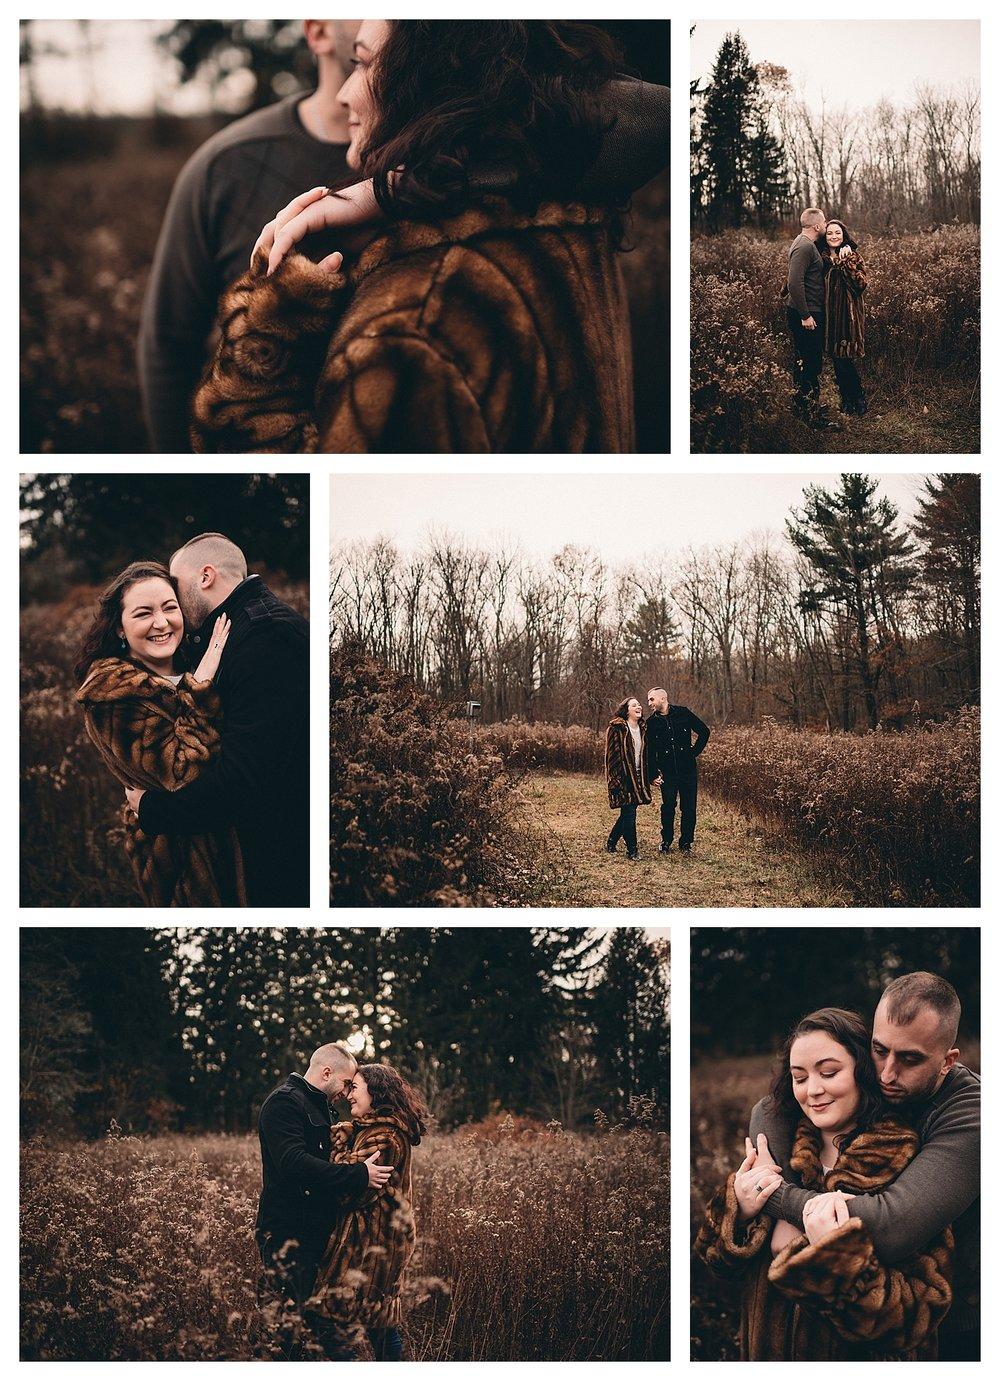 NEPA-Scranton-wedding-engagement-photographer-in-Philadelphia-PA-Central-PA_0310.jpg